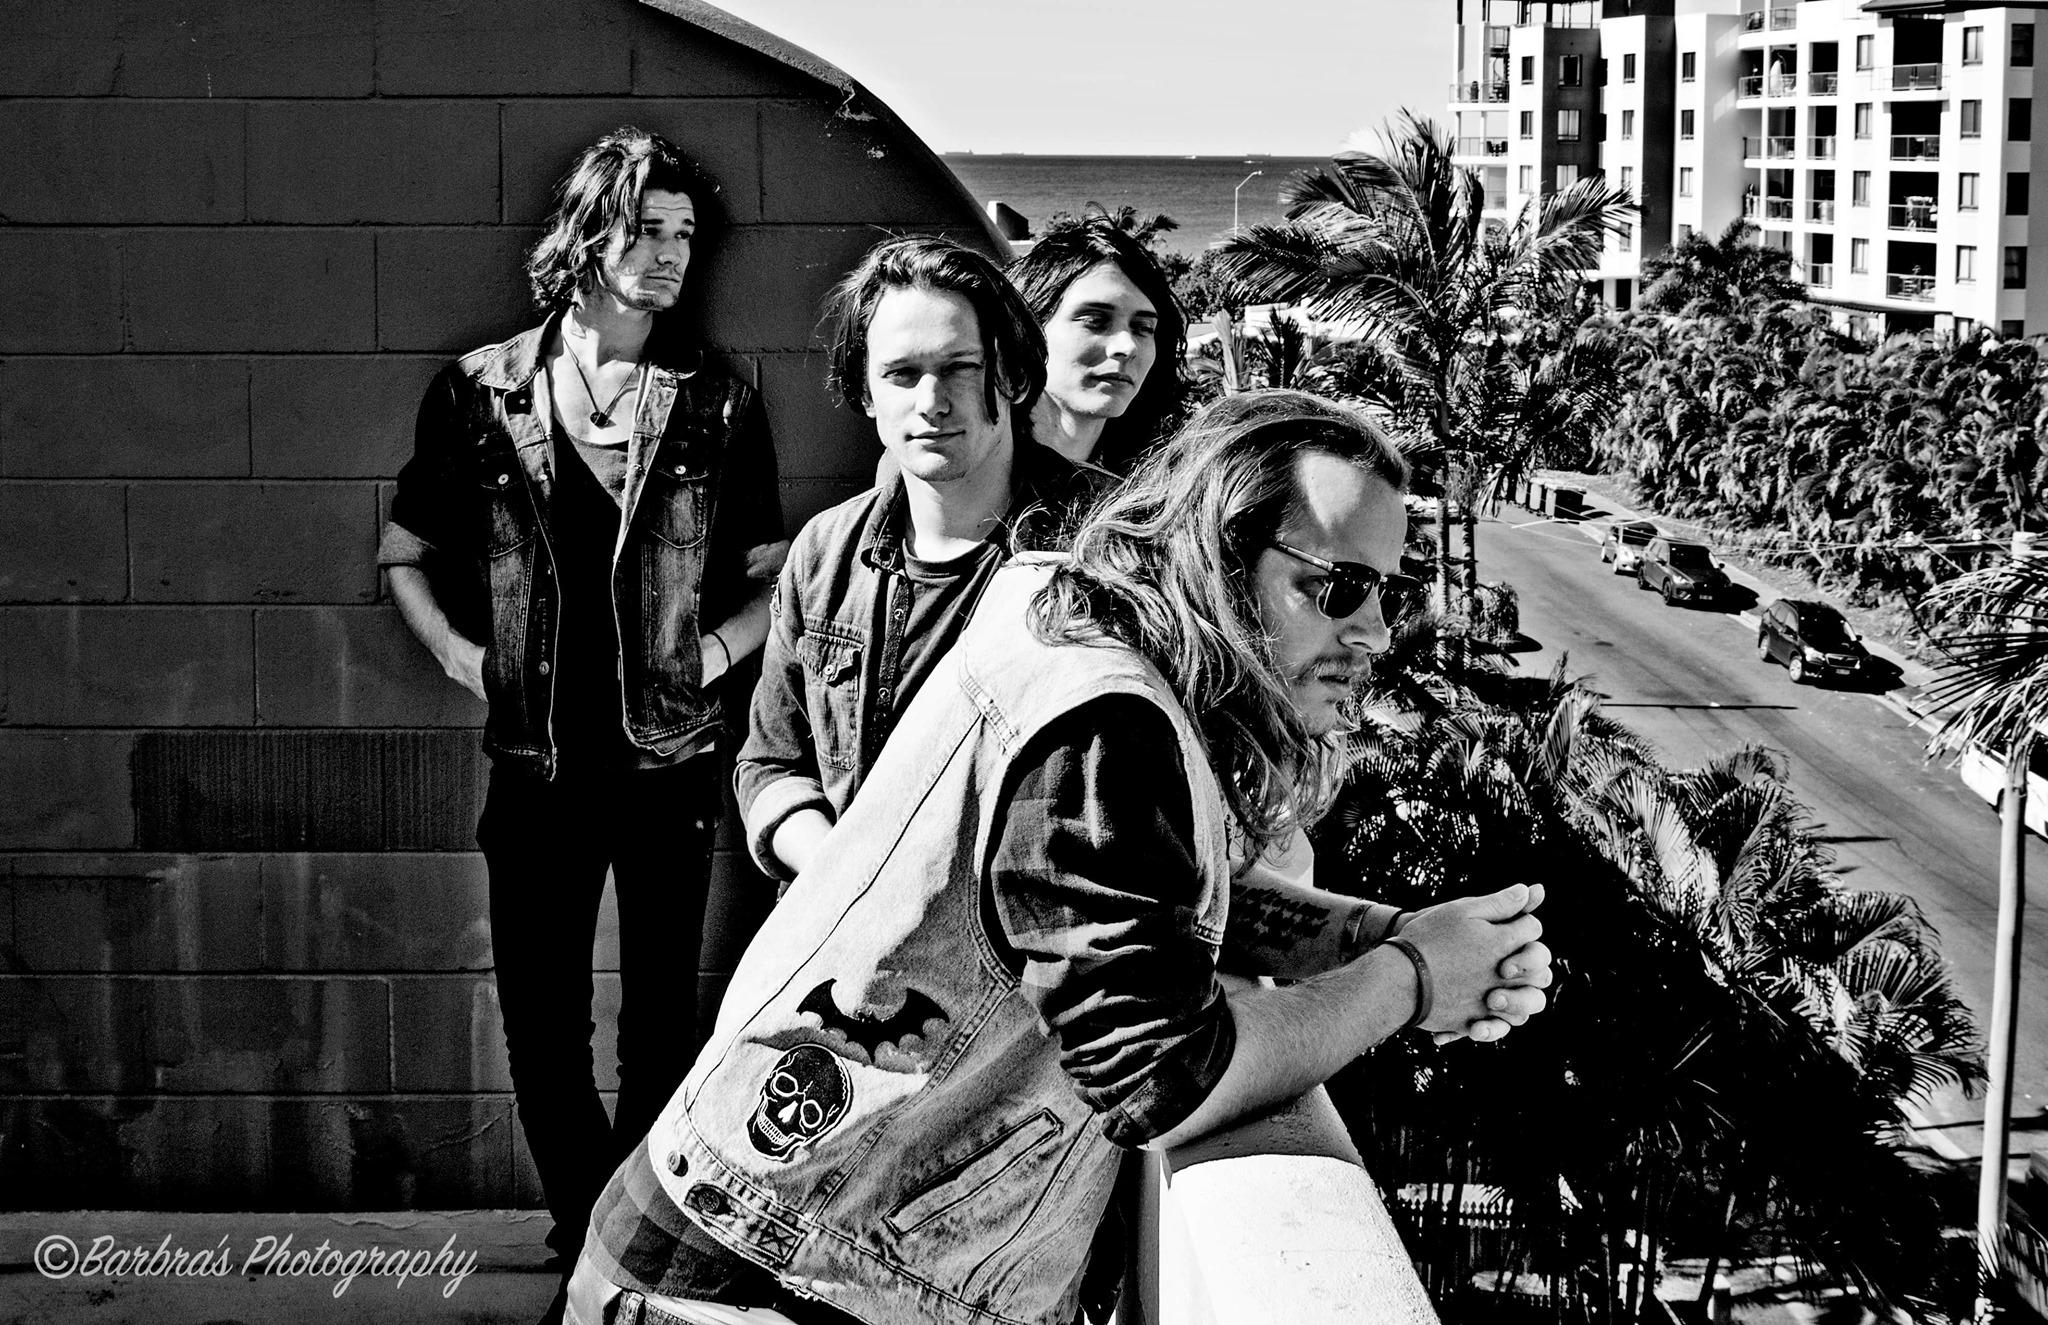 Fresh from their overseas tour, Whisky Grinn will headline the day, with Zac Lynch, Brody Lynchr, Matt Mackenzie, and Jack Flowers.